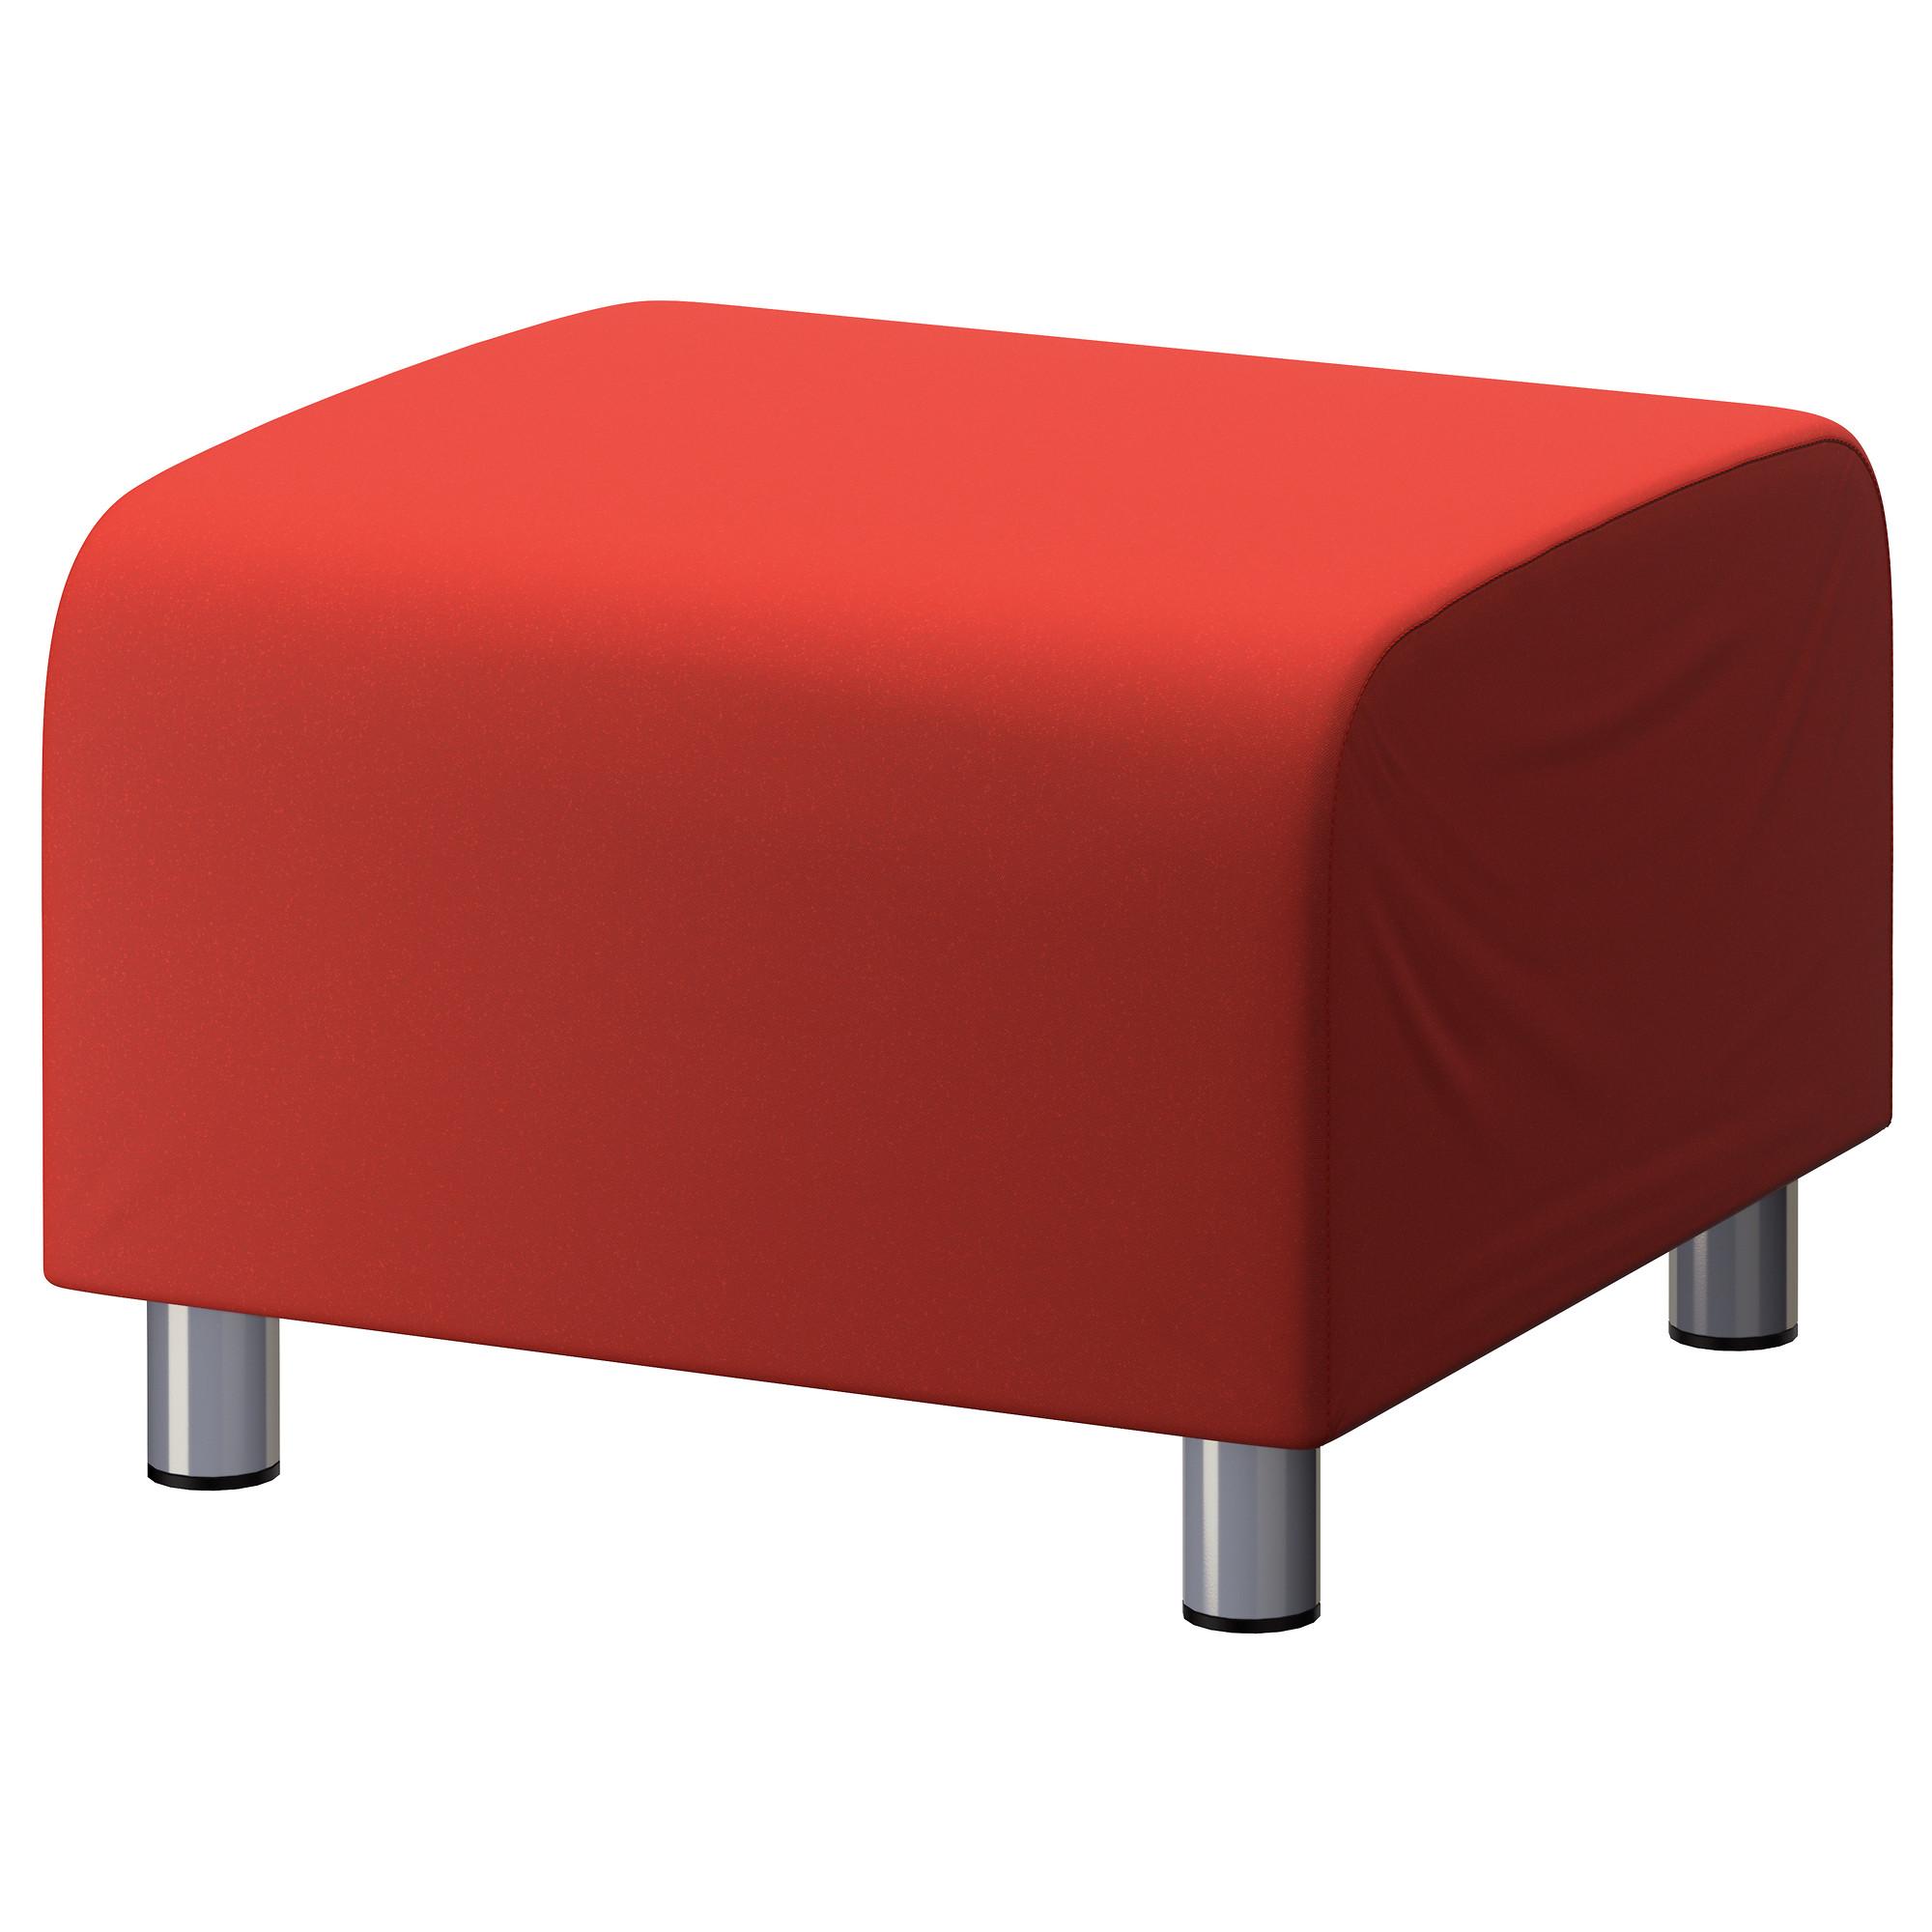 Red Cotton Custom Slip Cover For Ikea Klippan Footstool Sofa Cover Foot Stool Ebay